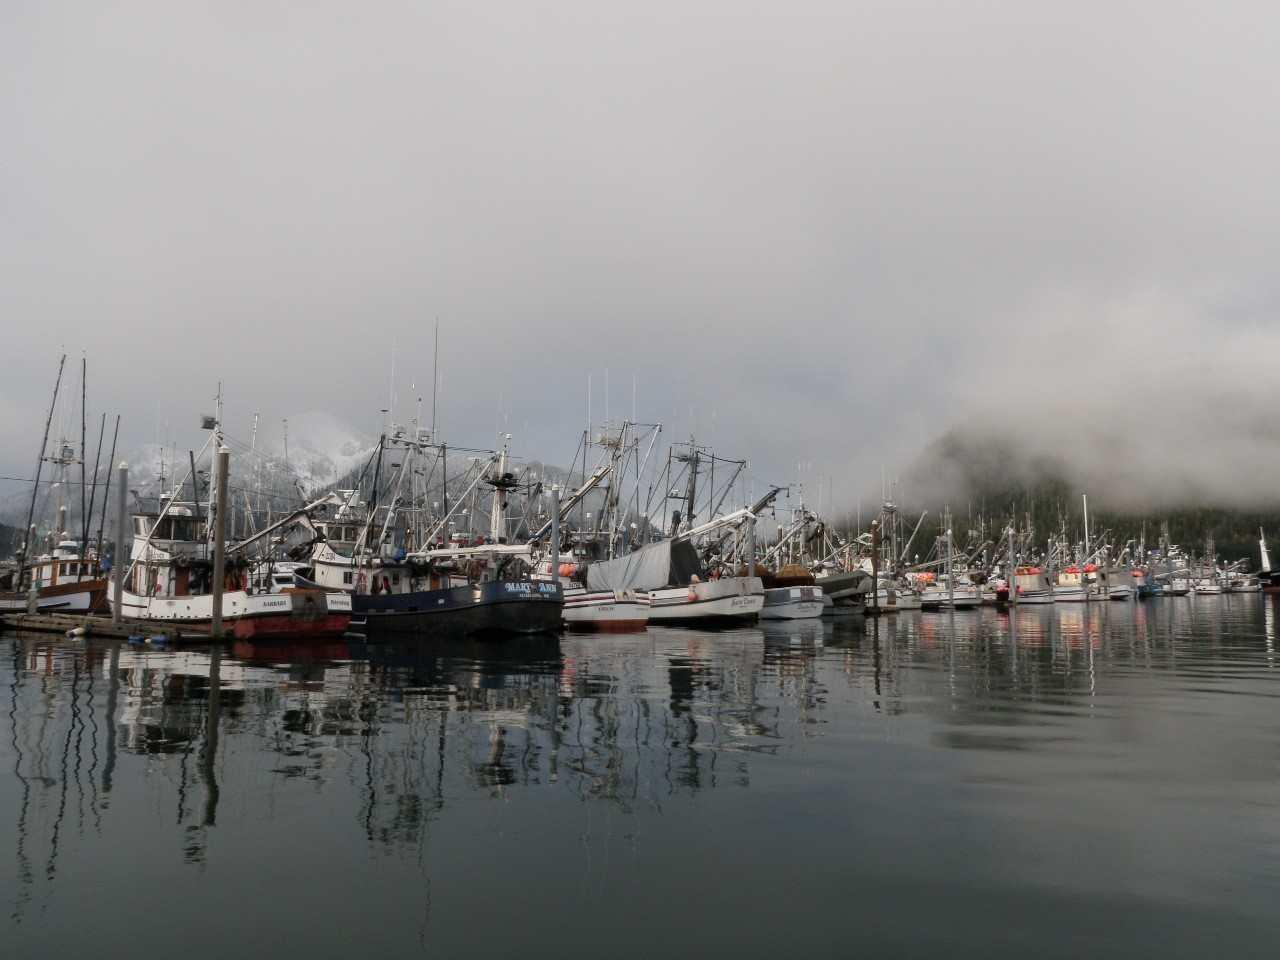 Dockside safety exams soon mandatory for many fishing boats